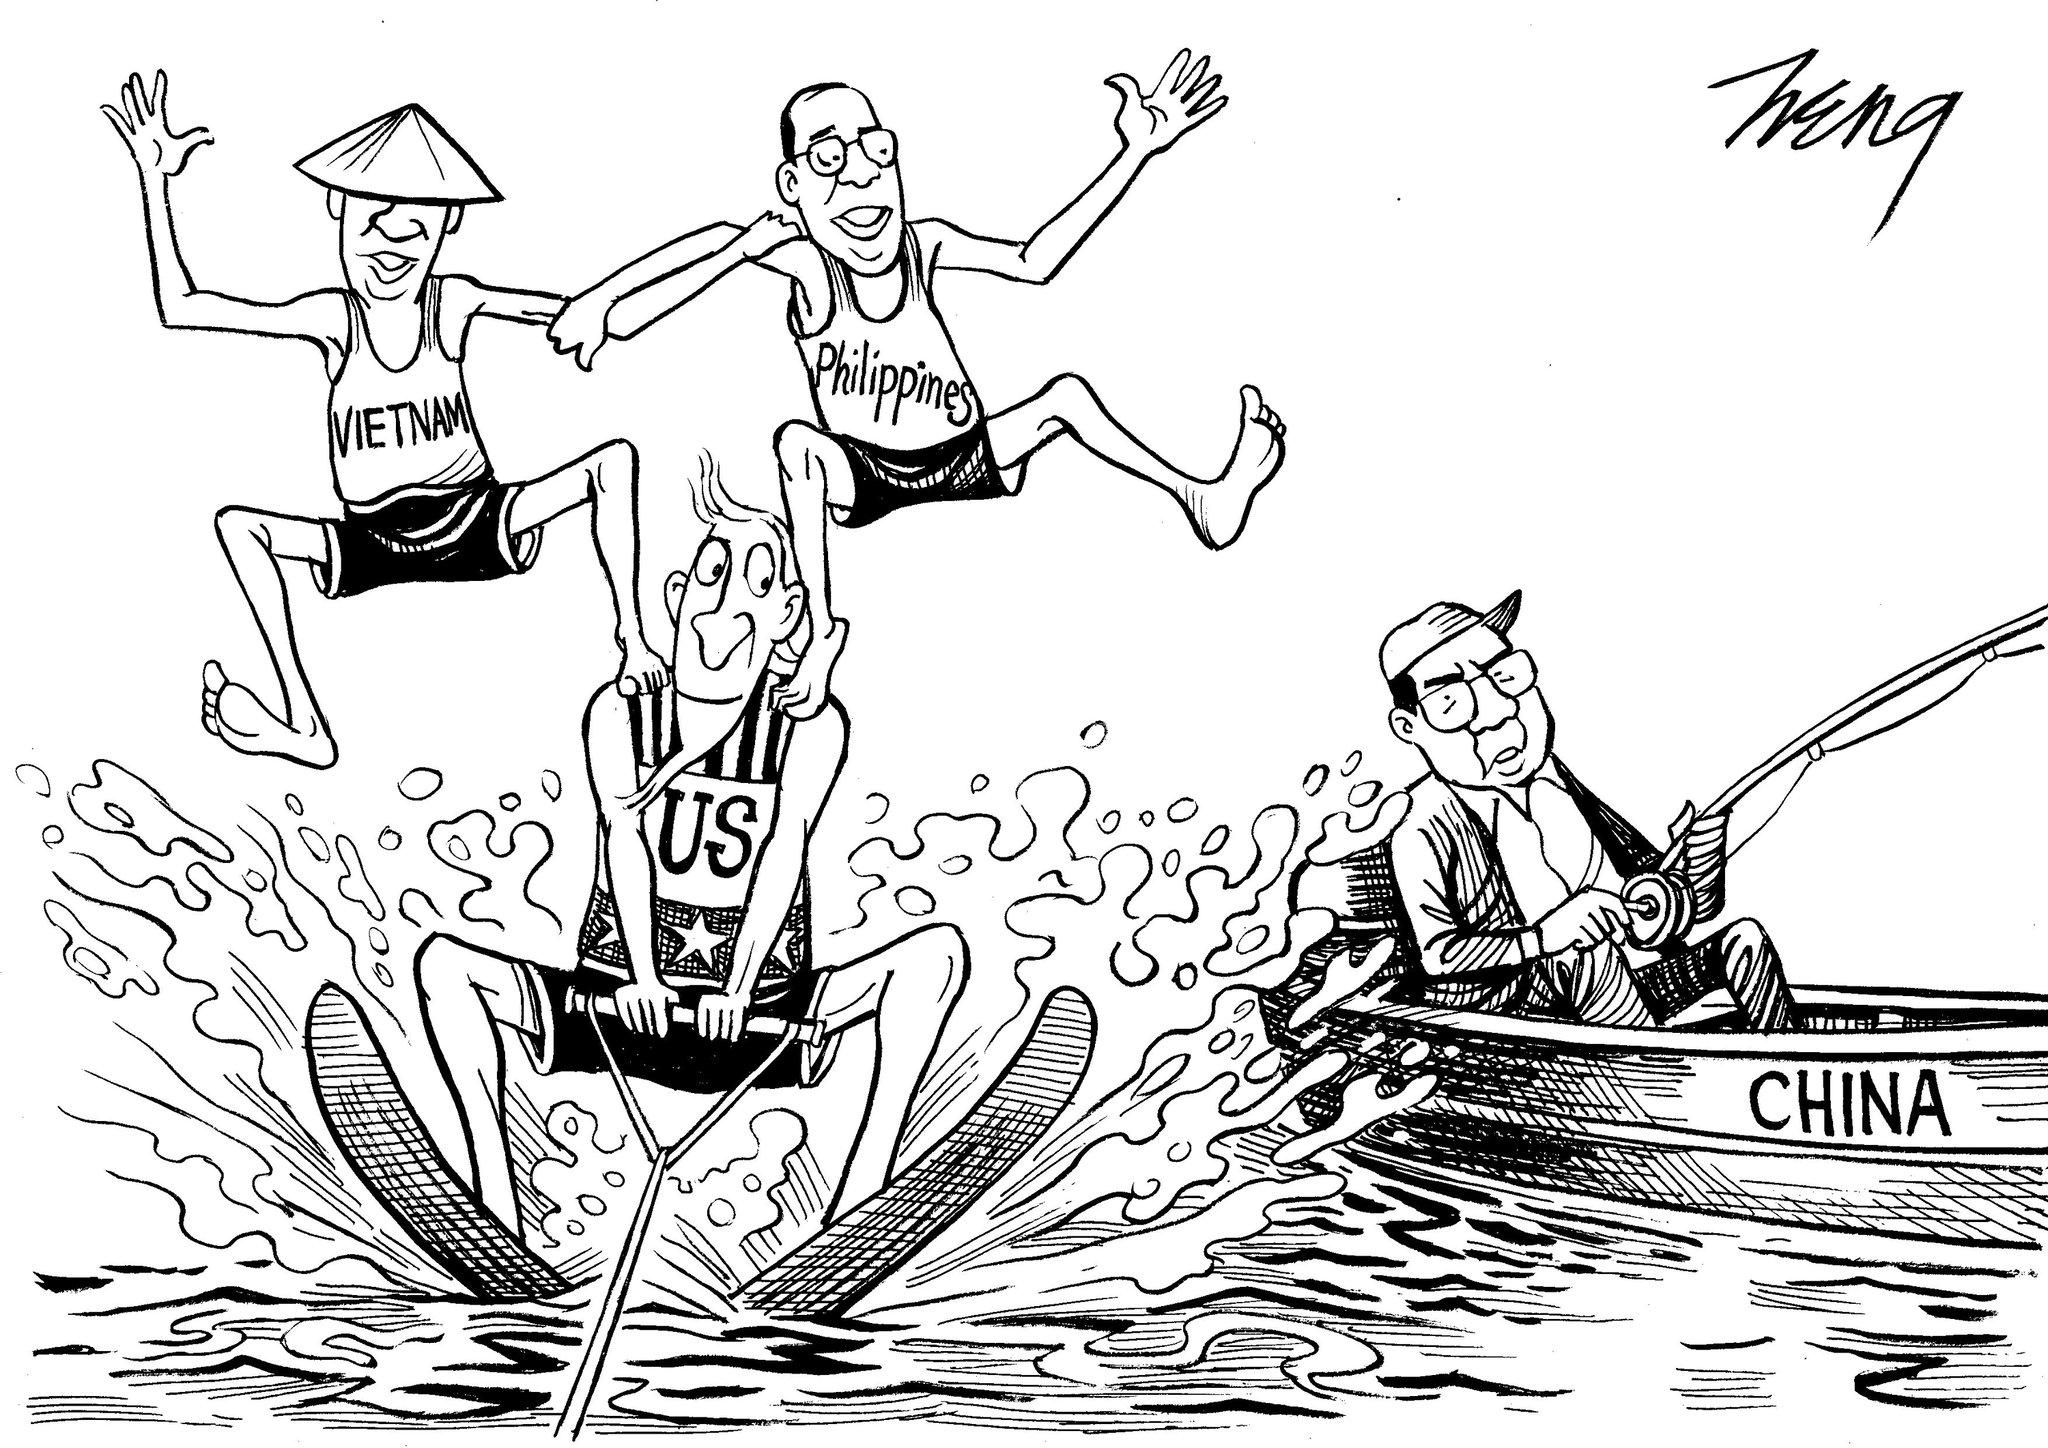 Editorial Cartoon Disputes Over The South China Sea